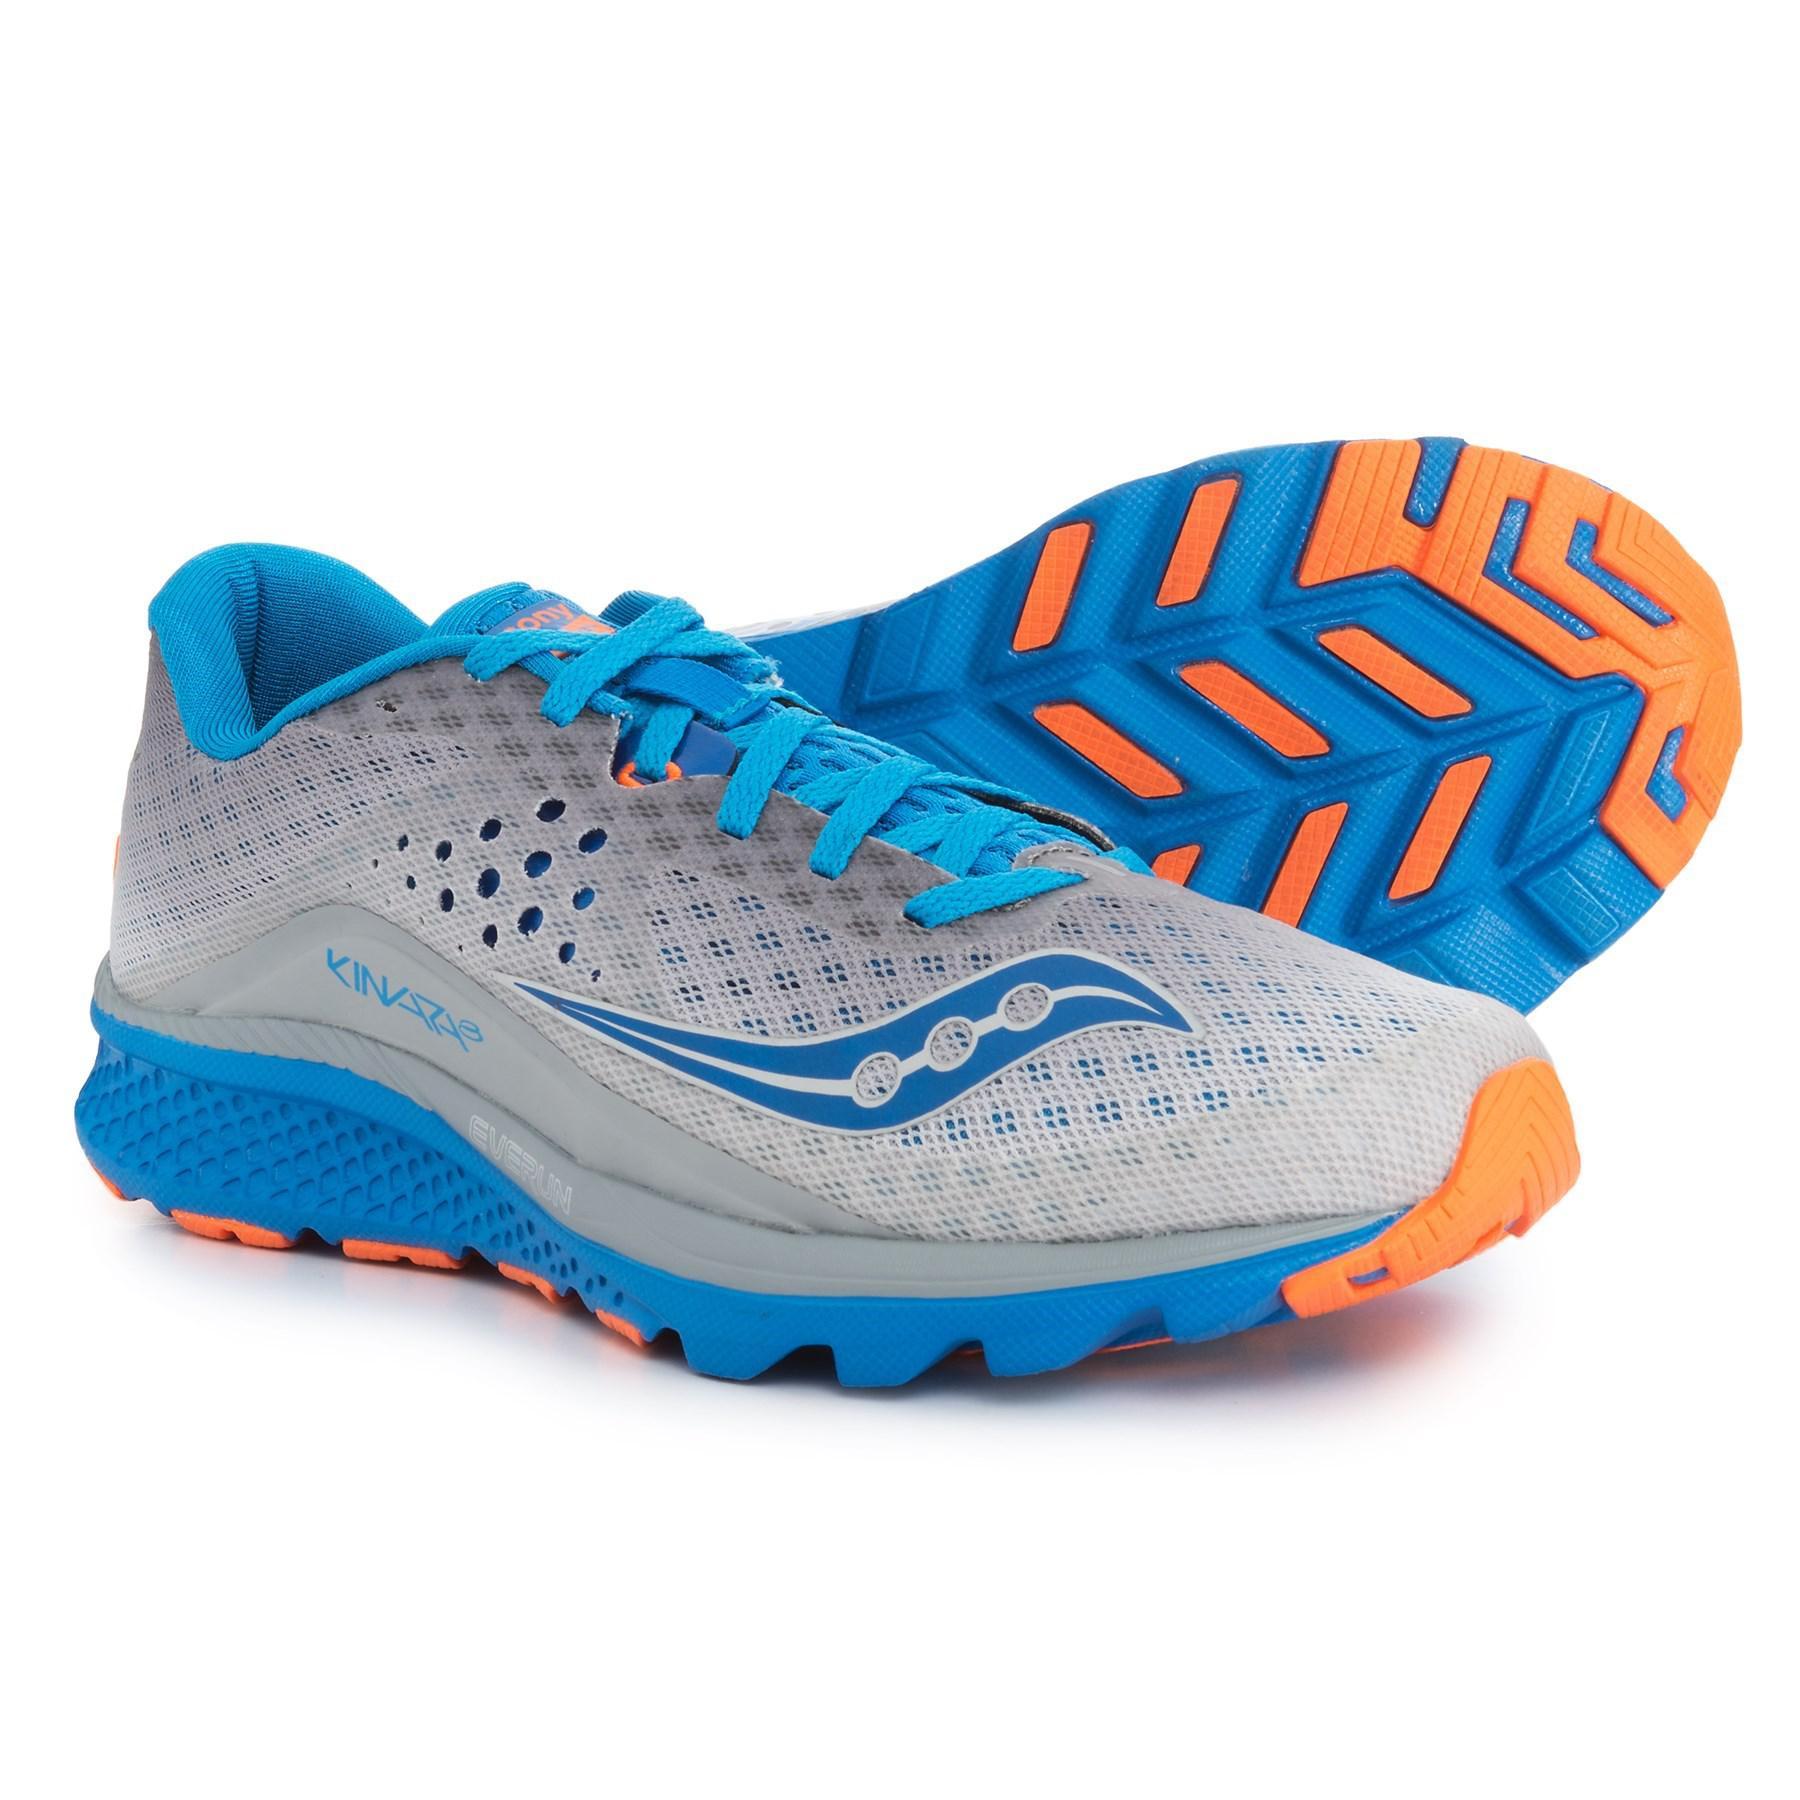 18b6b44a7256 Lyst - Saucony Kinvara 8 Running Shoes (for Men) in Blue for Men